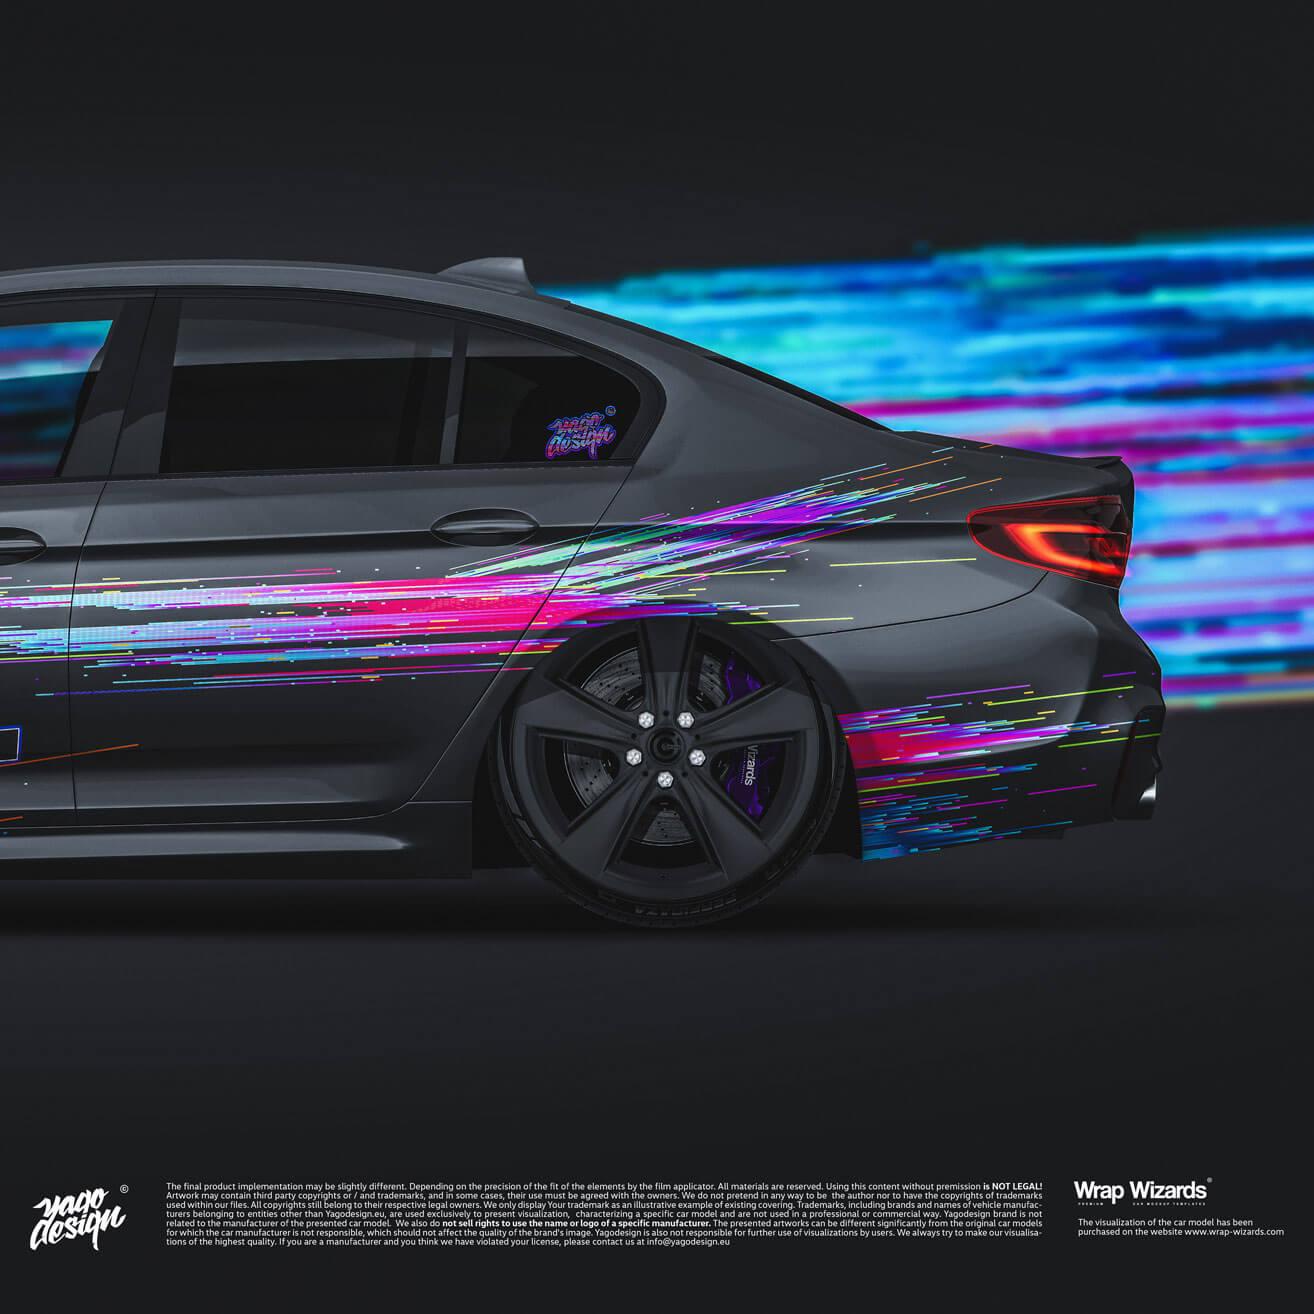 Volkswagen-Golf-MK8-by-Yagodesign-2020-BGScarstyle-SIDE2-3500px1